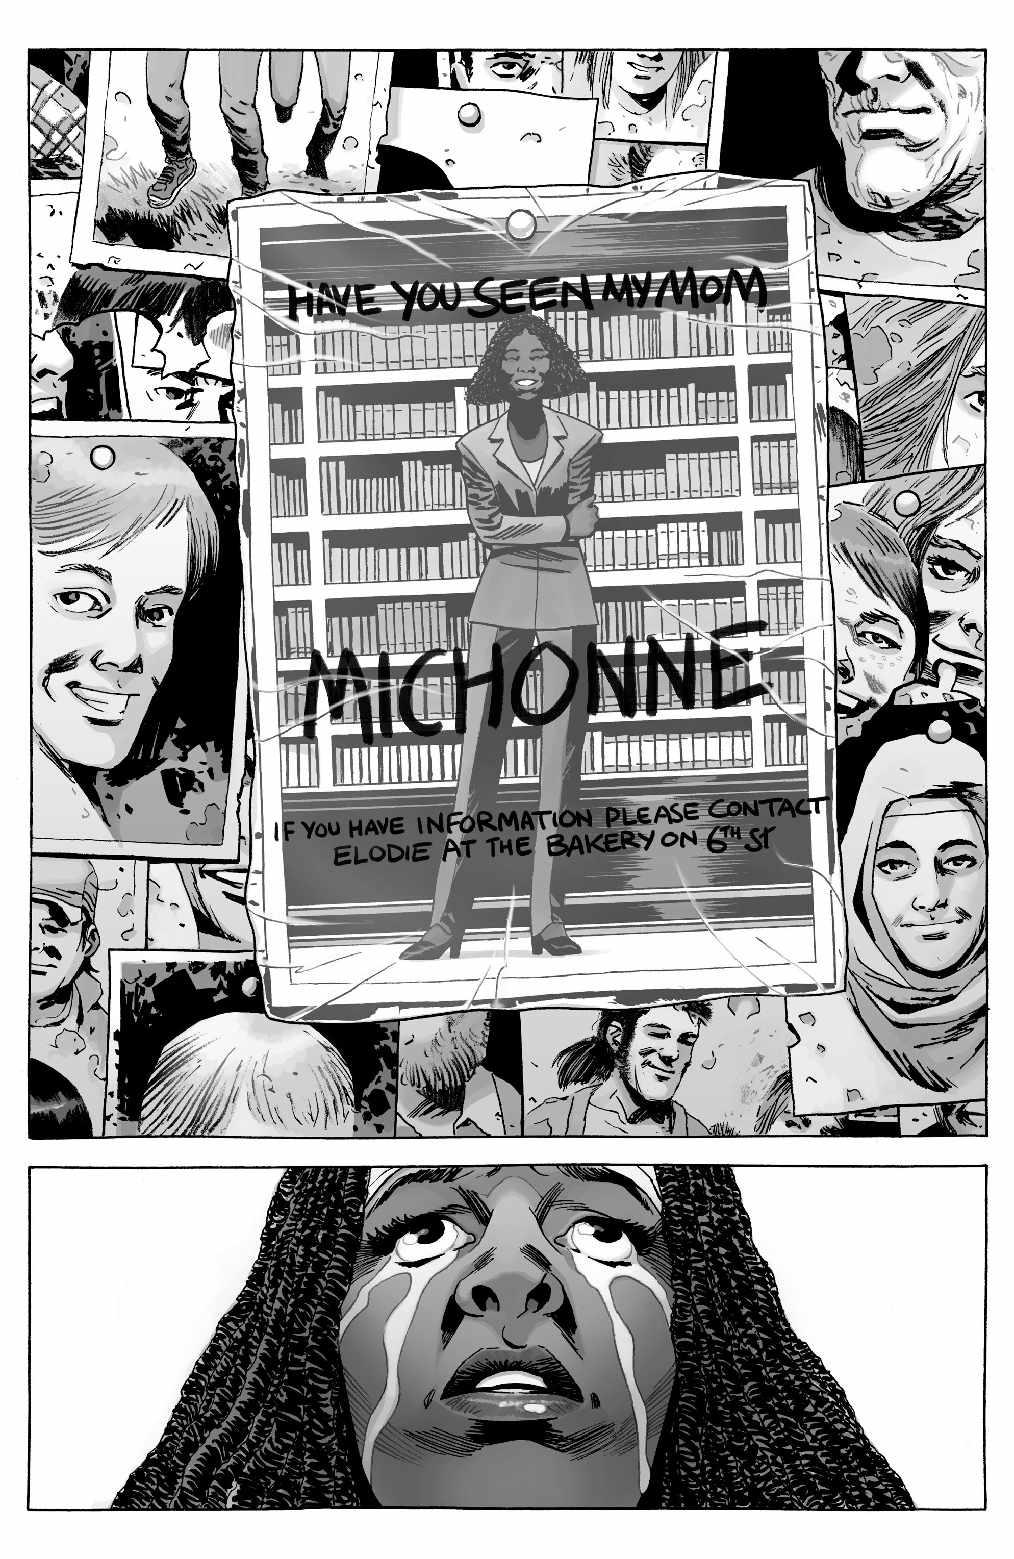 Read Comics Online Free - The Walking Dead - Chapter 175